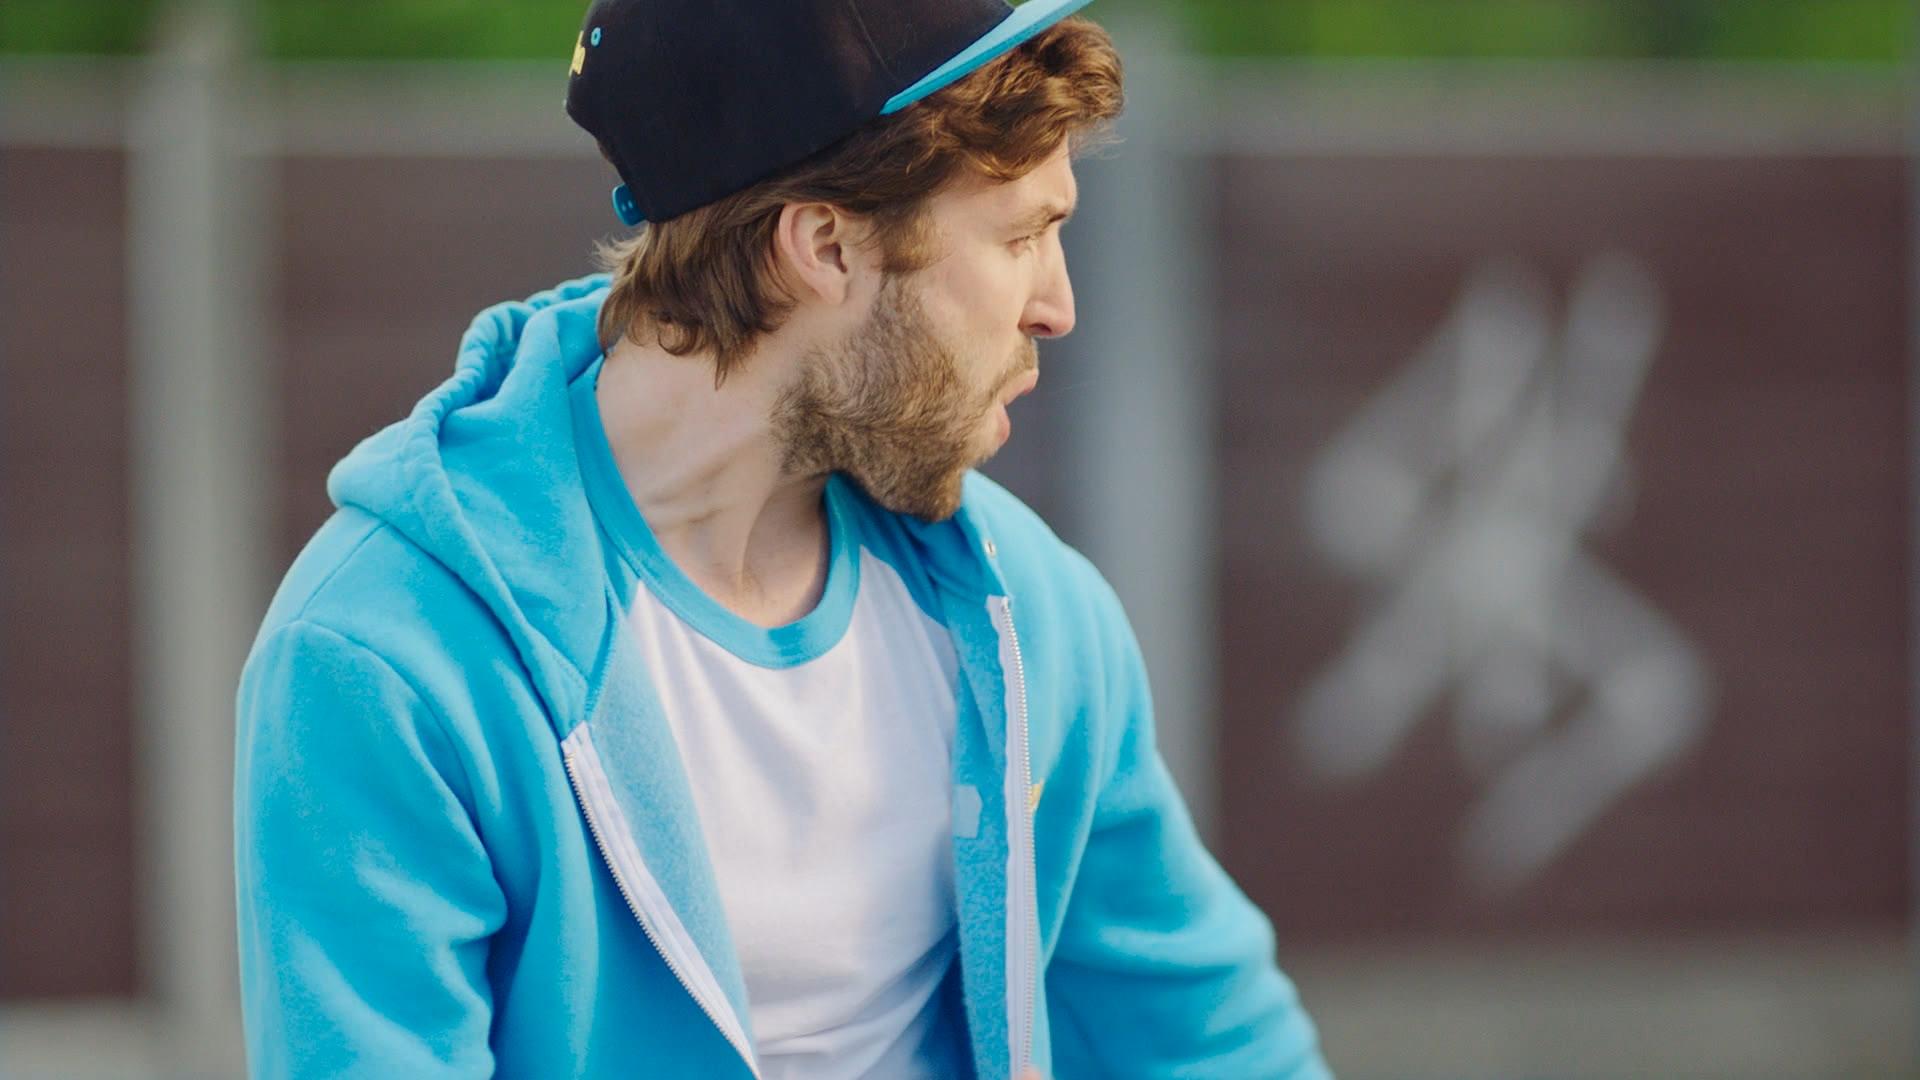 Dairylea 'Skateboard' - Directed by David Mould @ 76ltd